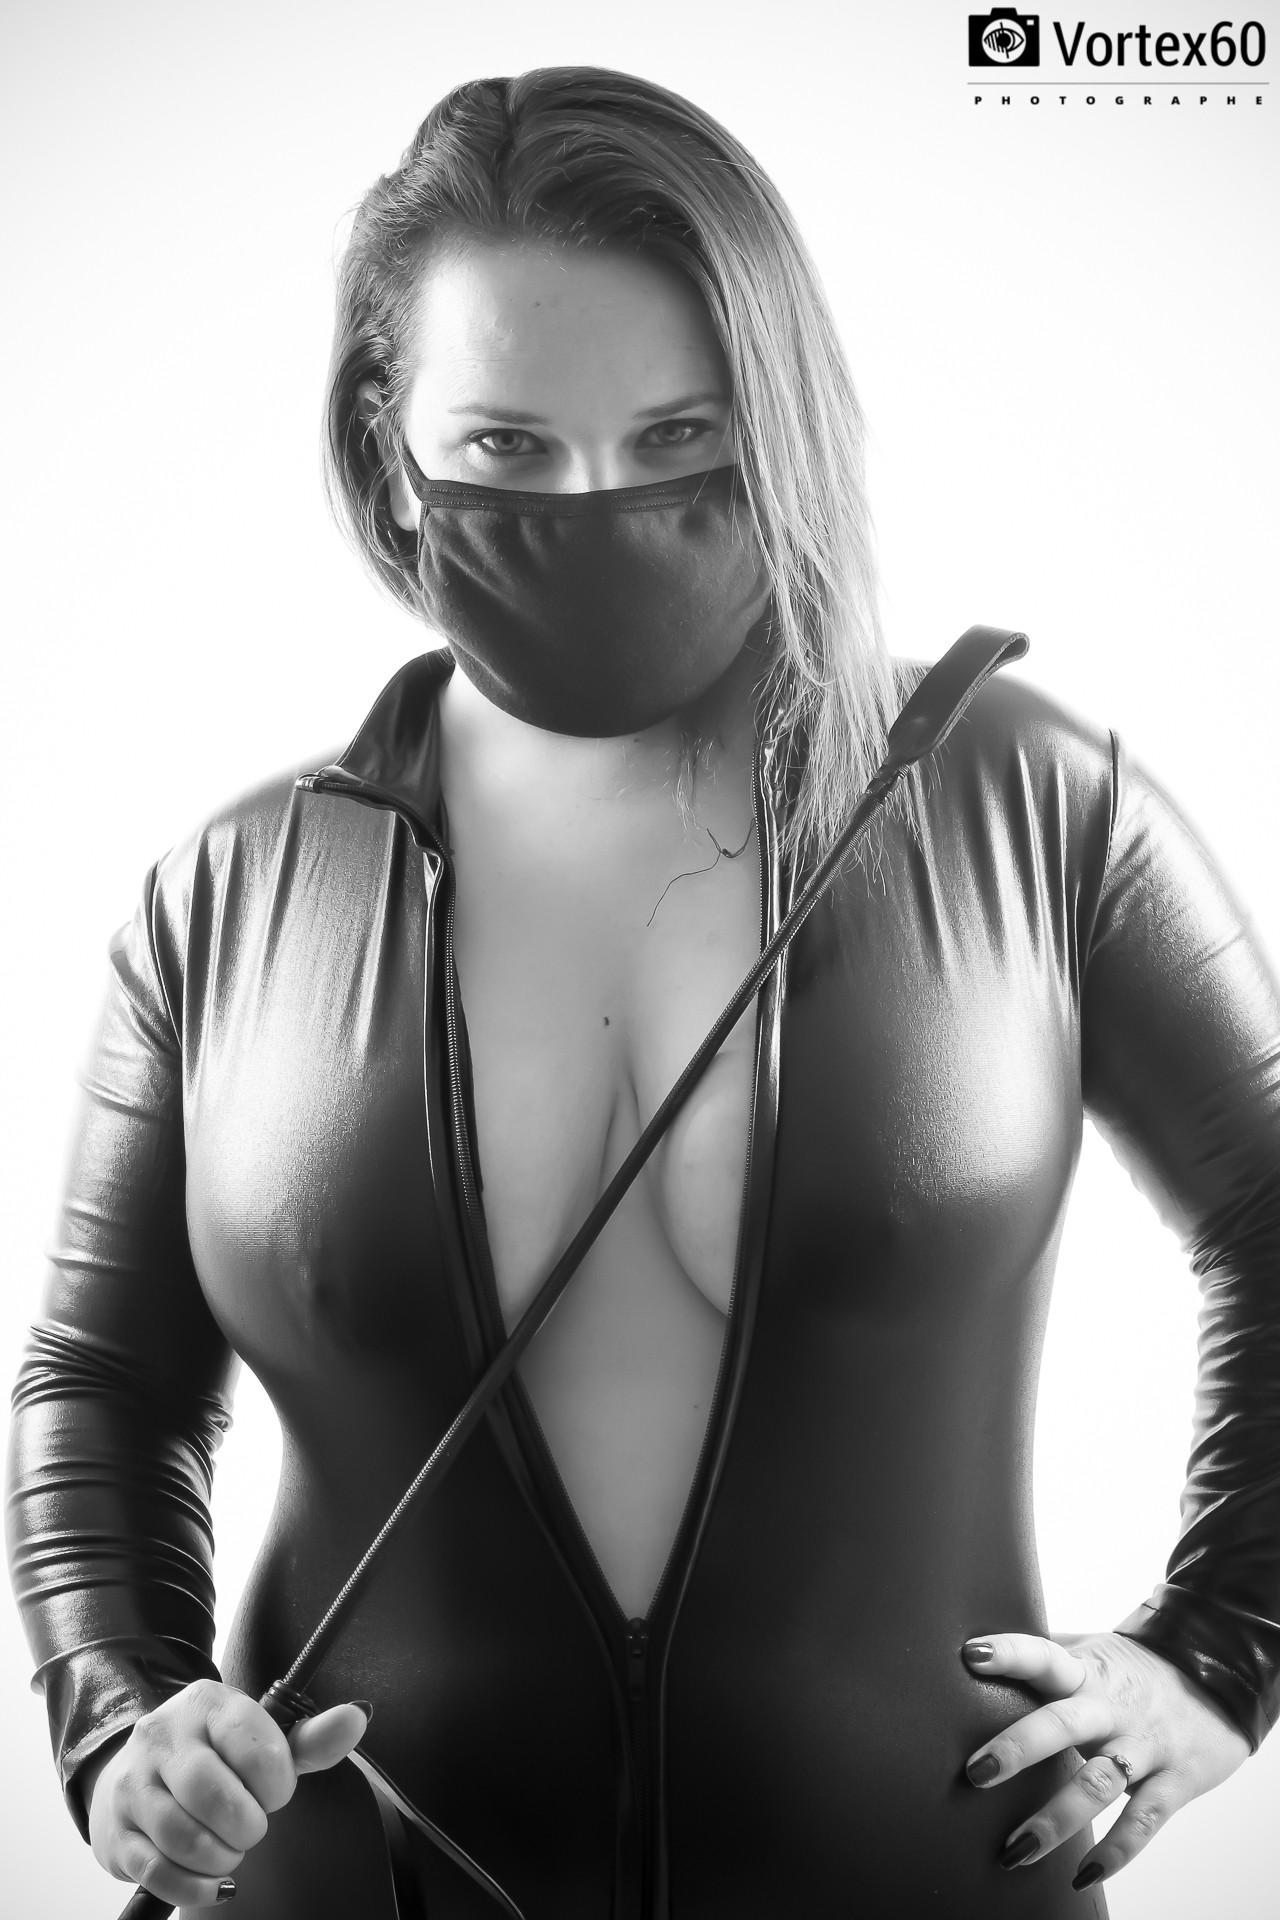 masqué by vortex60 photographe